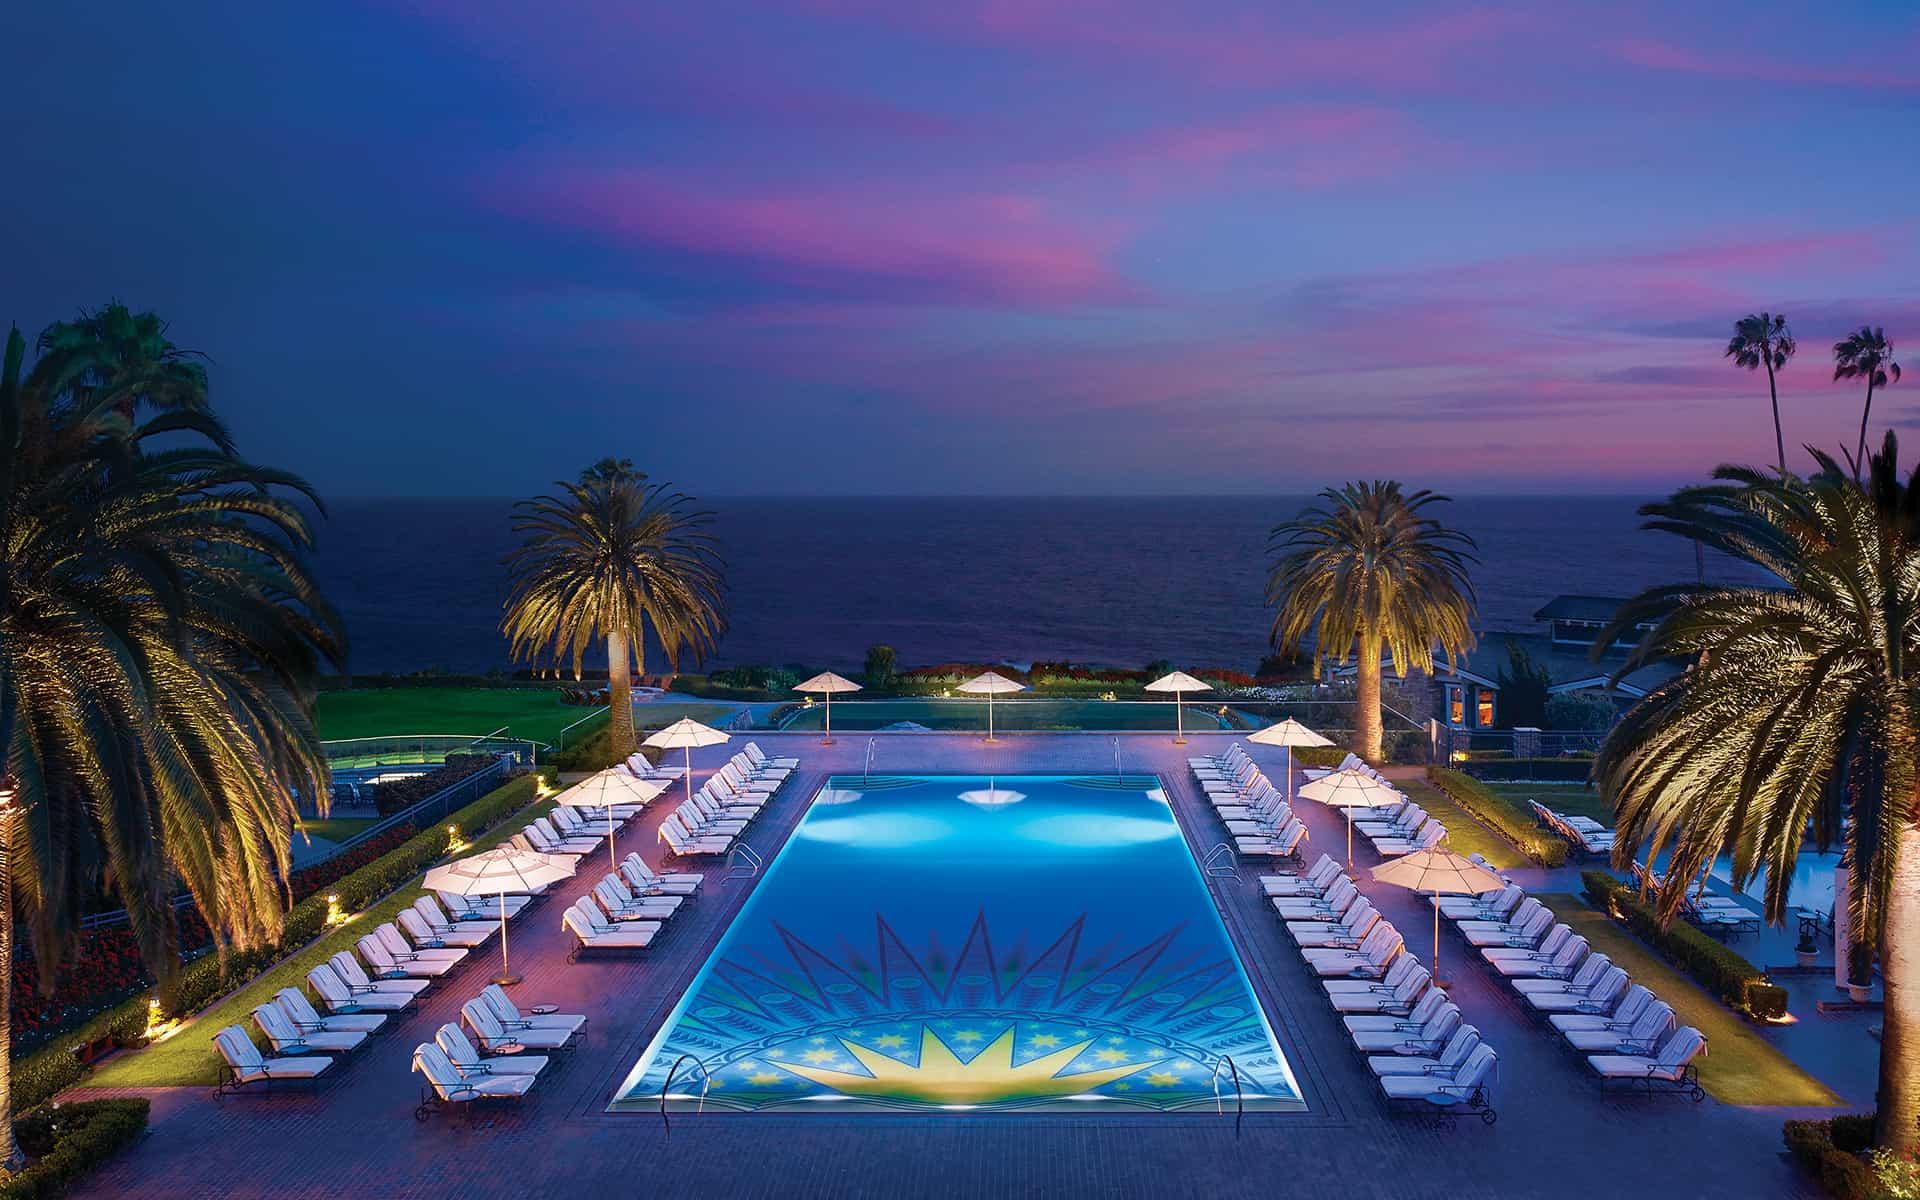 laguna beach hotel image gallery montage laguna beach. Black Bedroom Furniture Sets. Home Design Ideas